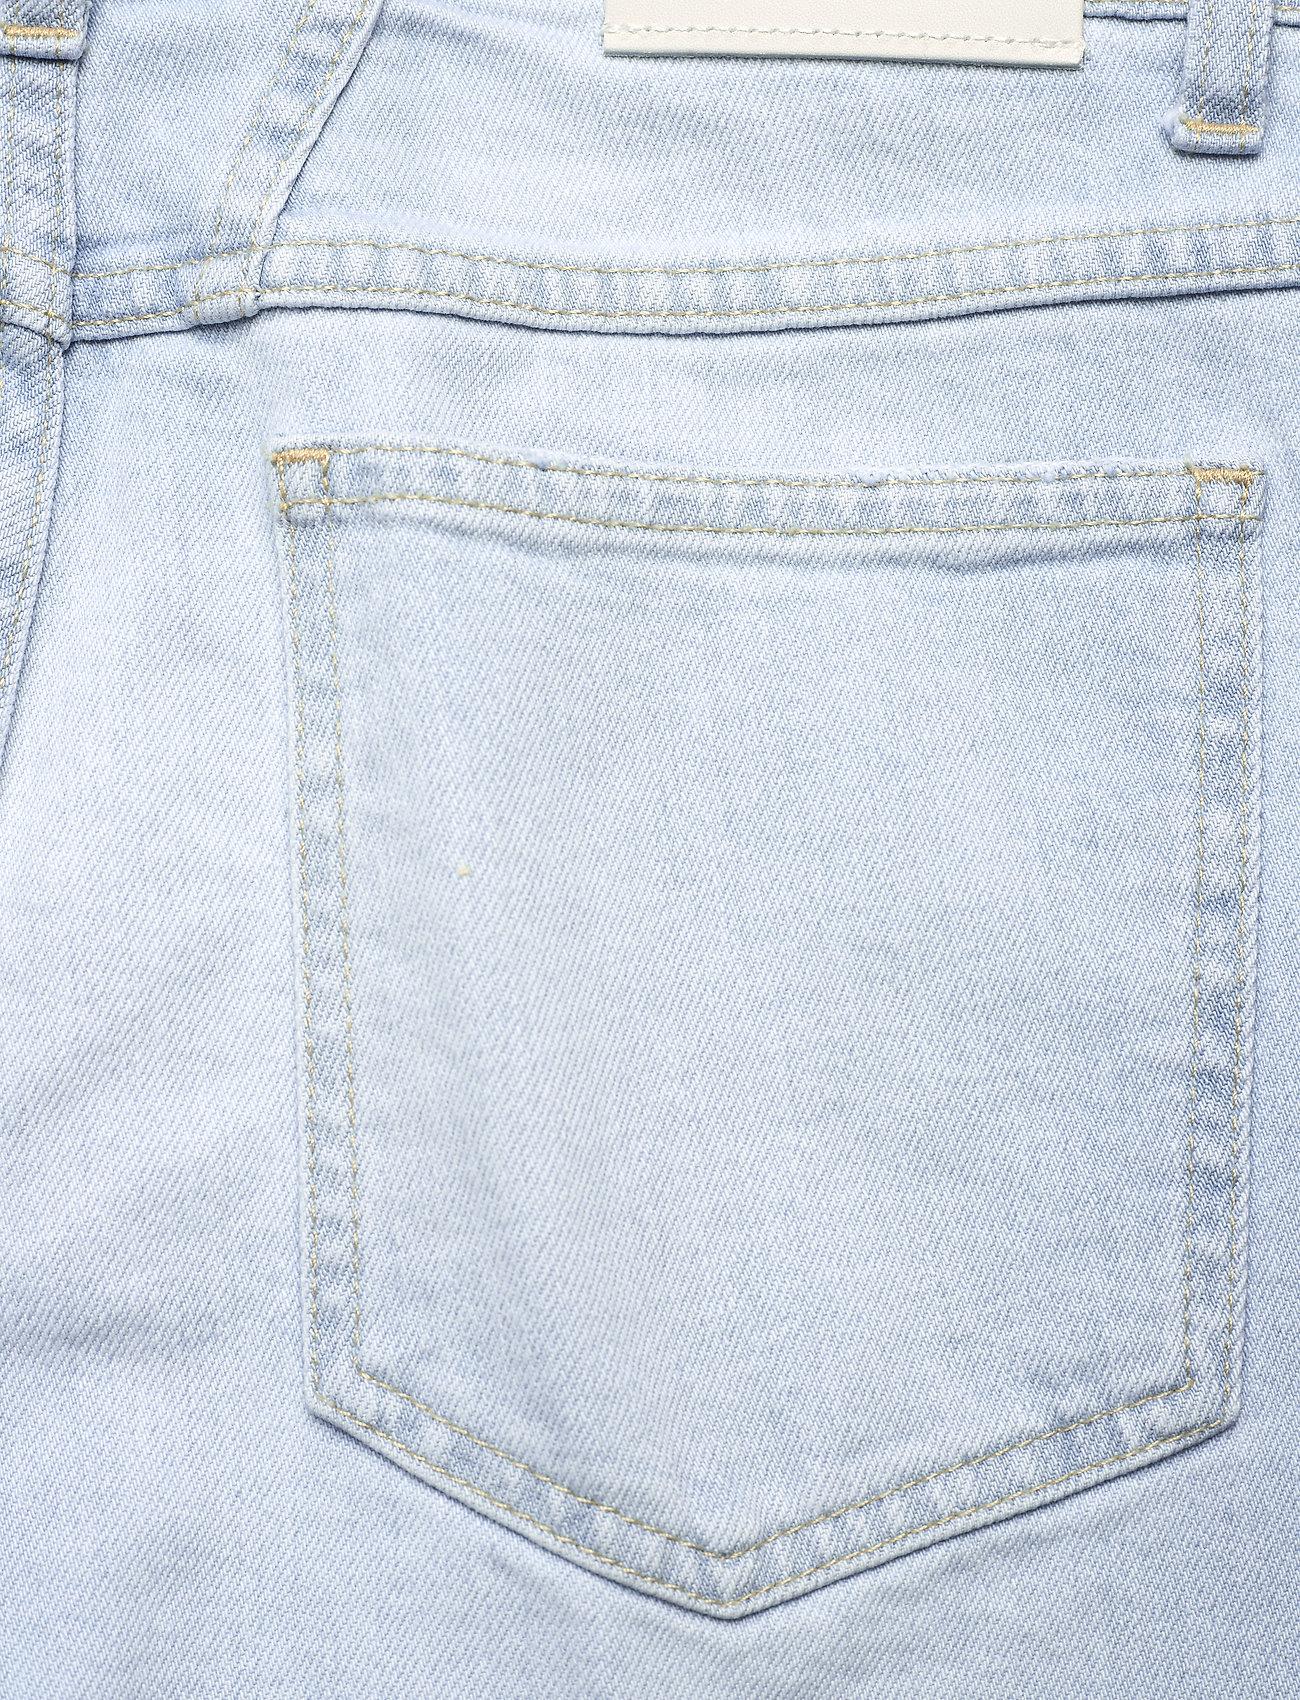 Closed - womens pant - straight regular - light blue - 4